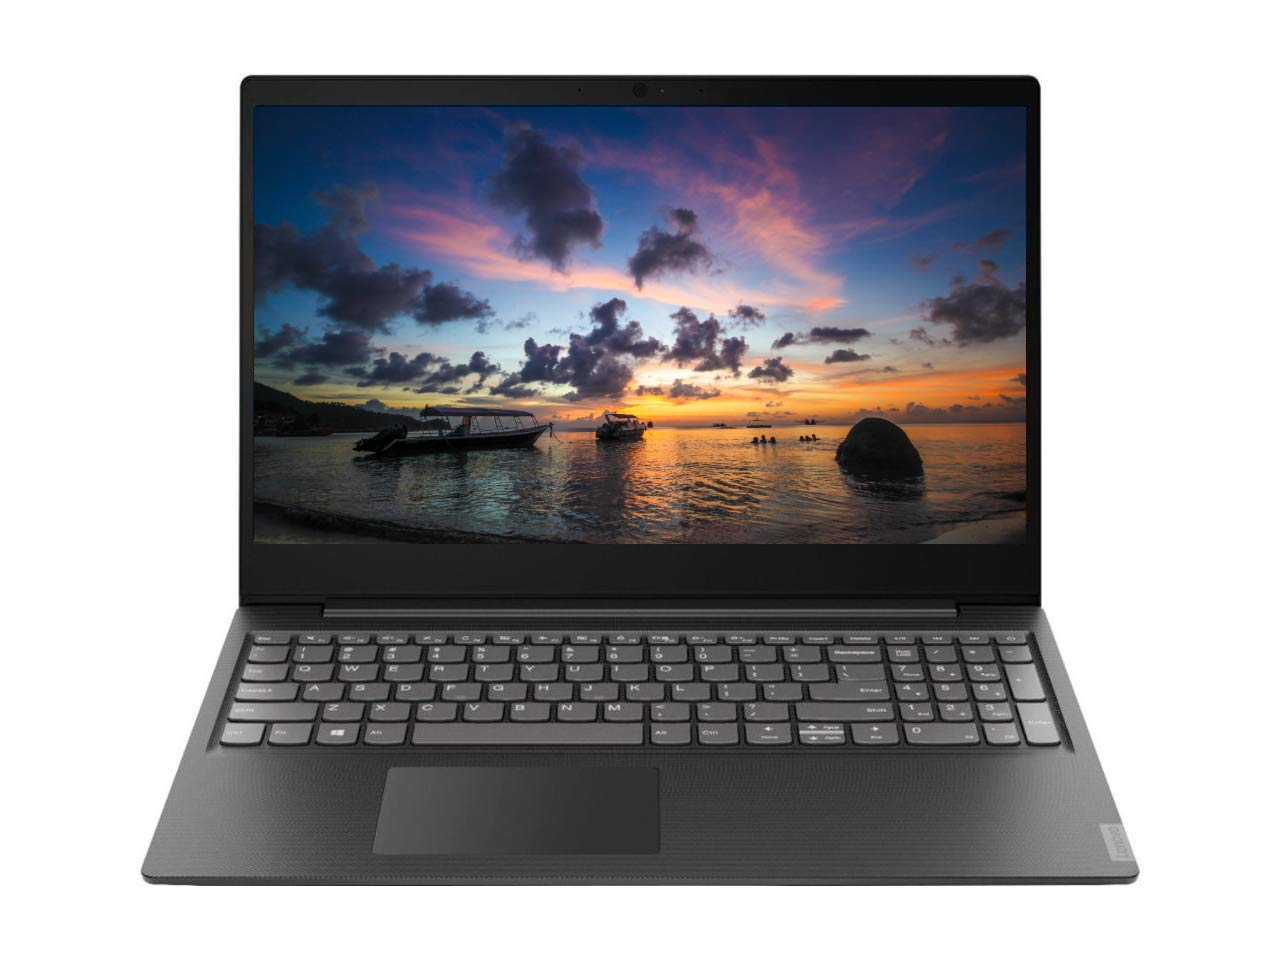 Flagship Lenovo Bluetooth Graphics Accessories